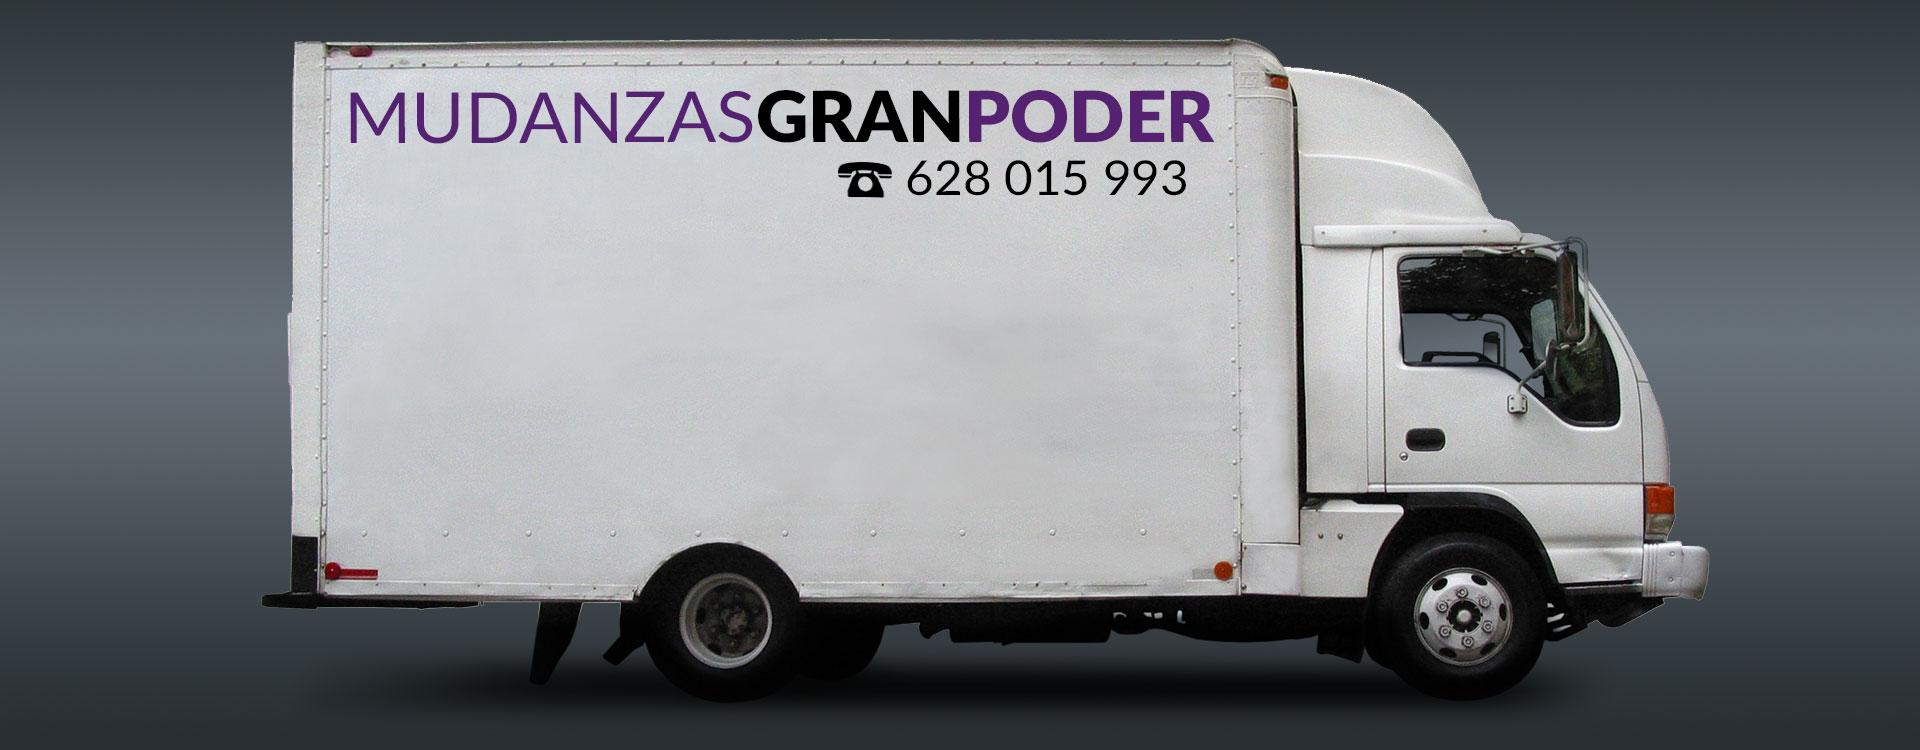 mudanzas-gran-poder-sevilla-telefono - AndaluNet el portal de Sevilla